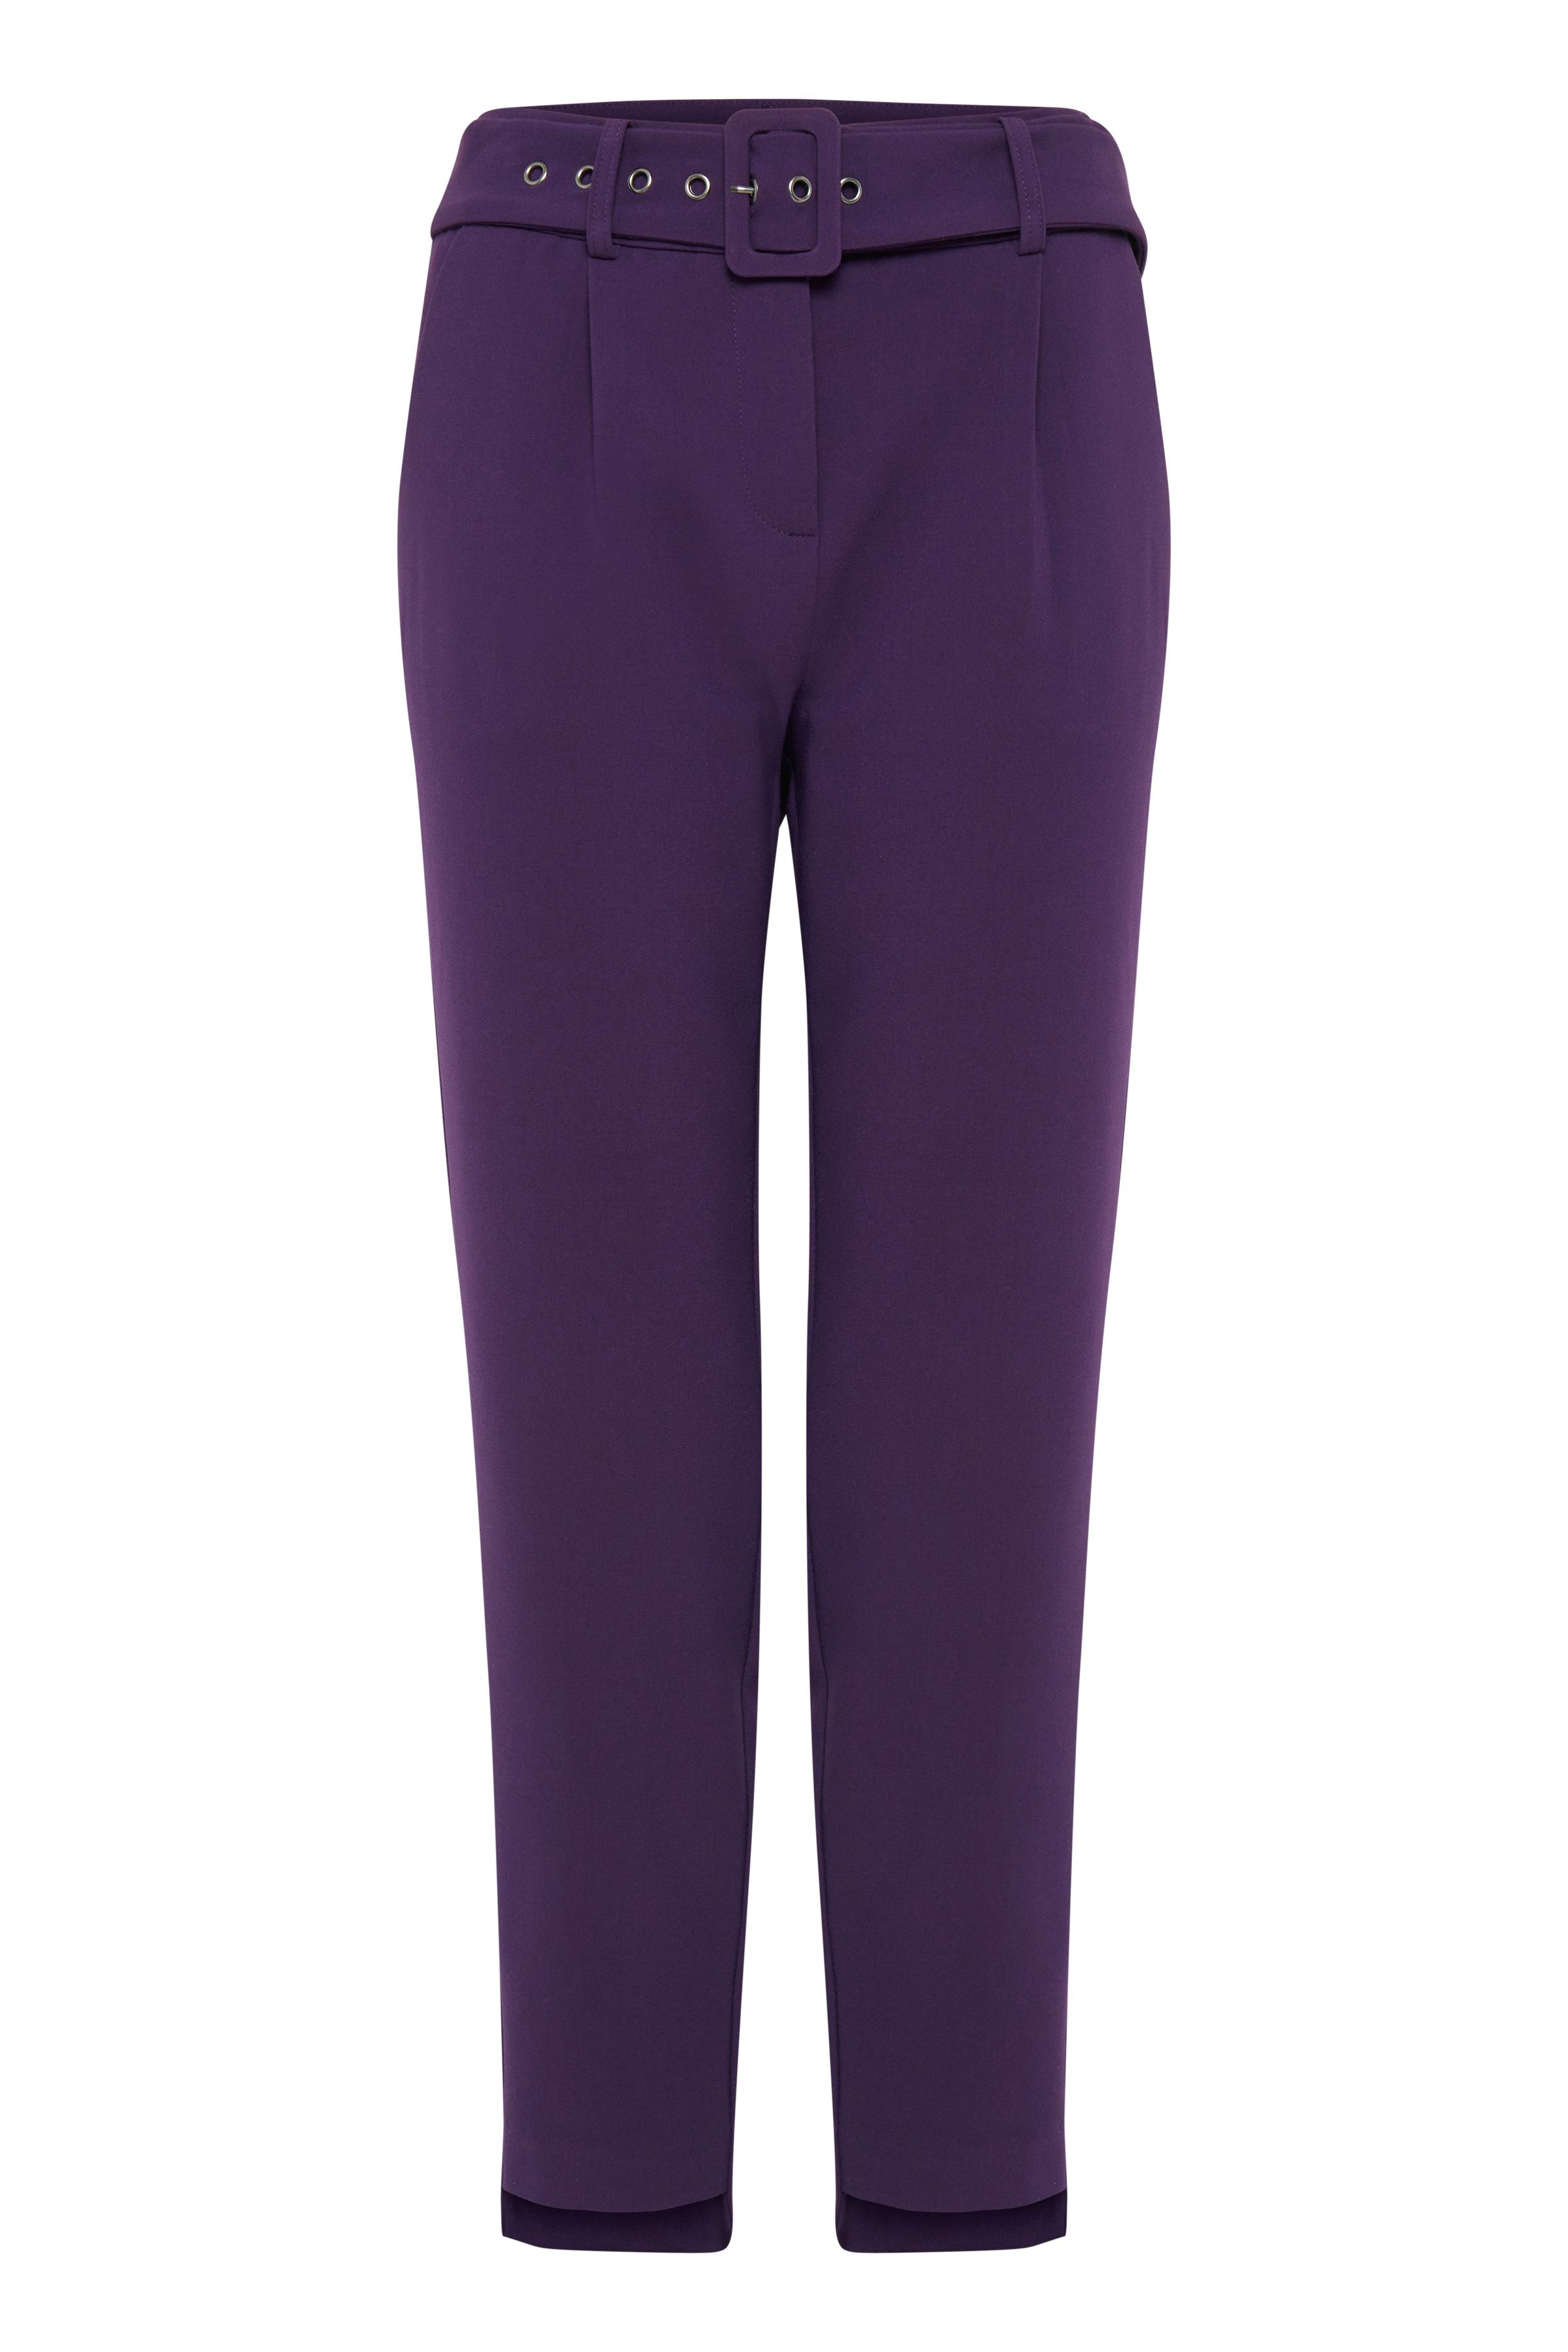 Blackberry Purple